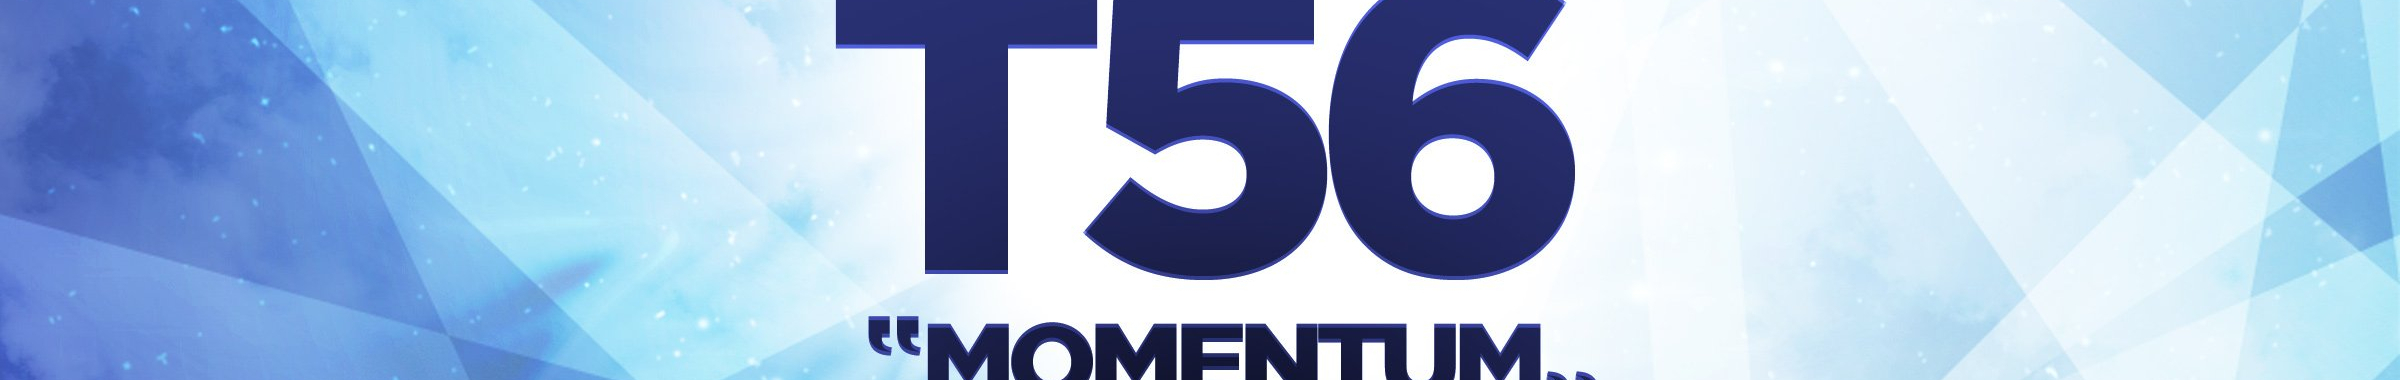 T56 Momentum